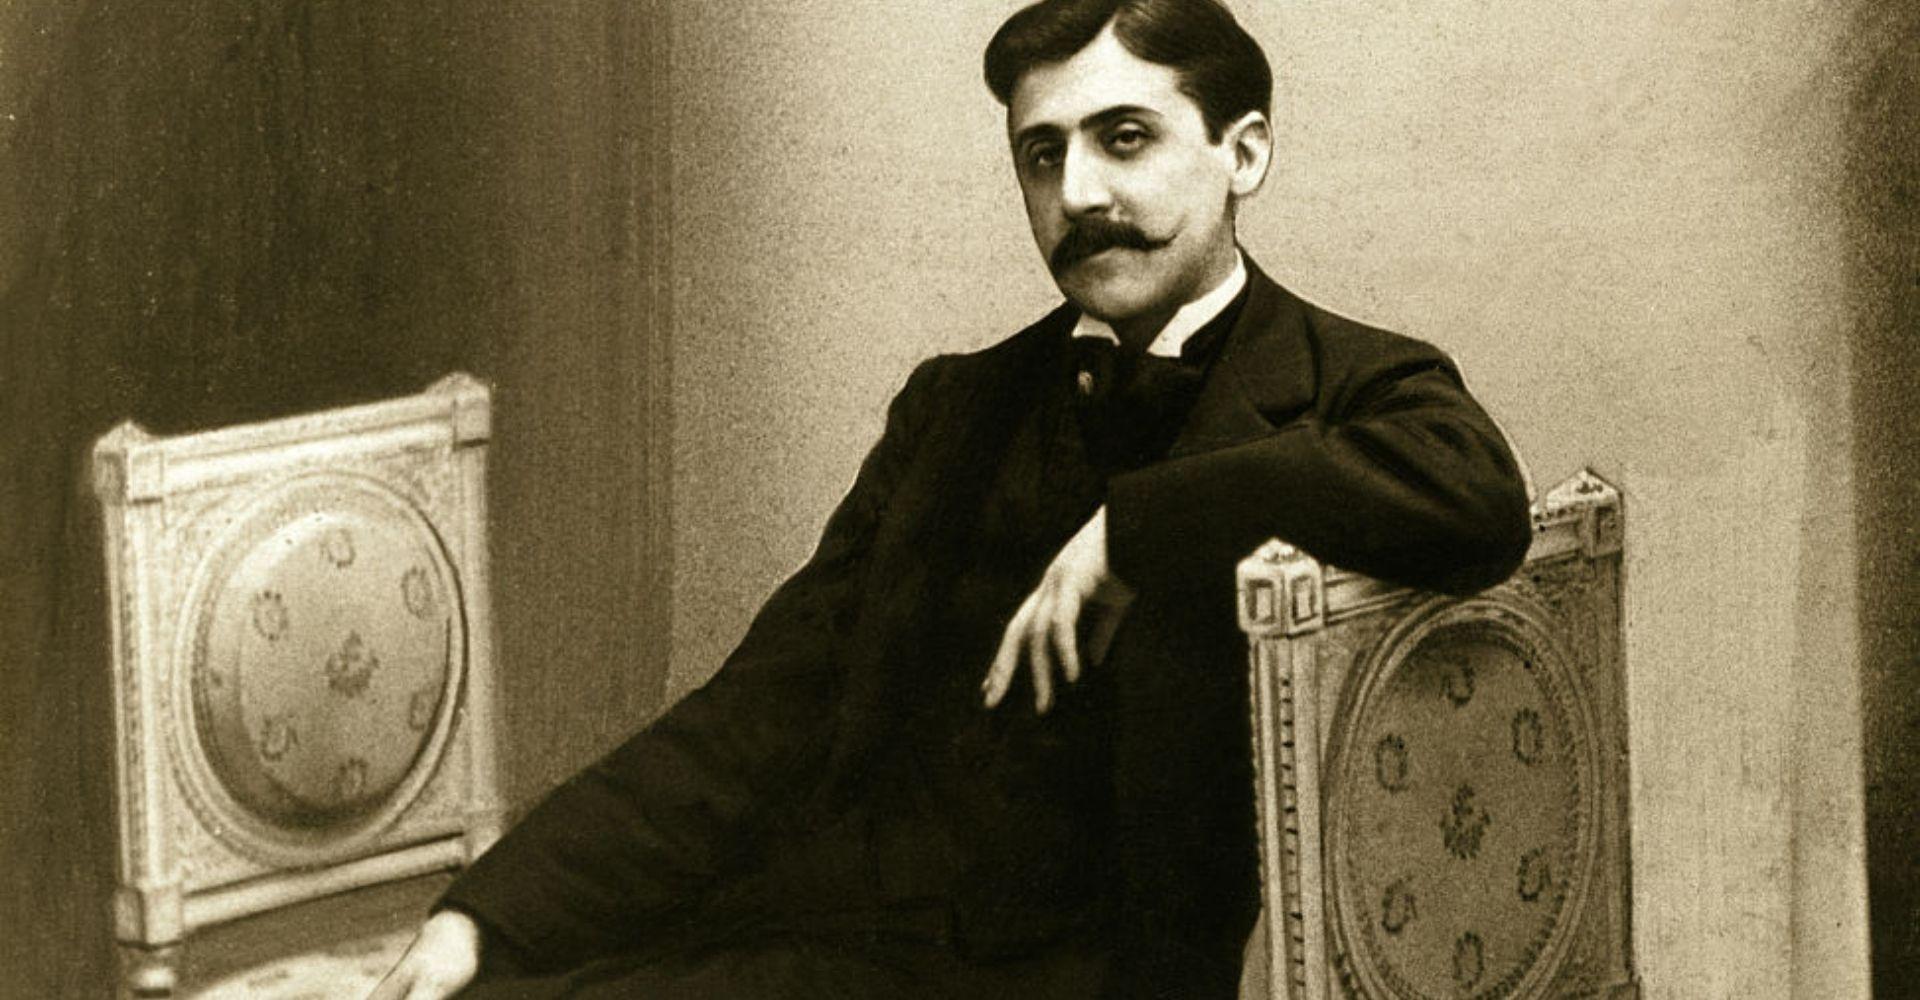 Chi ha paura di Marcel Proust?